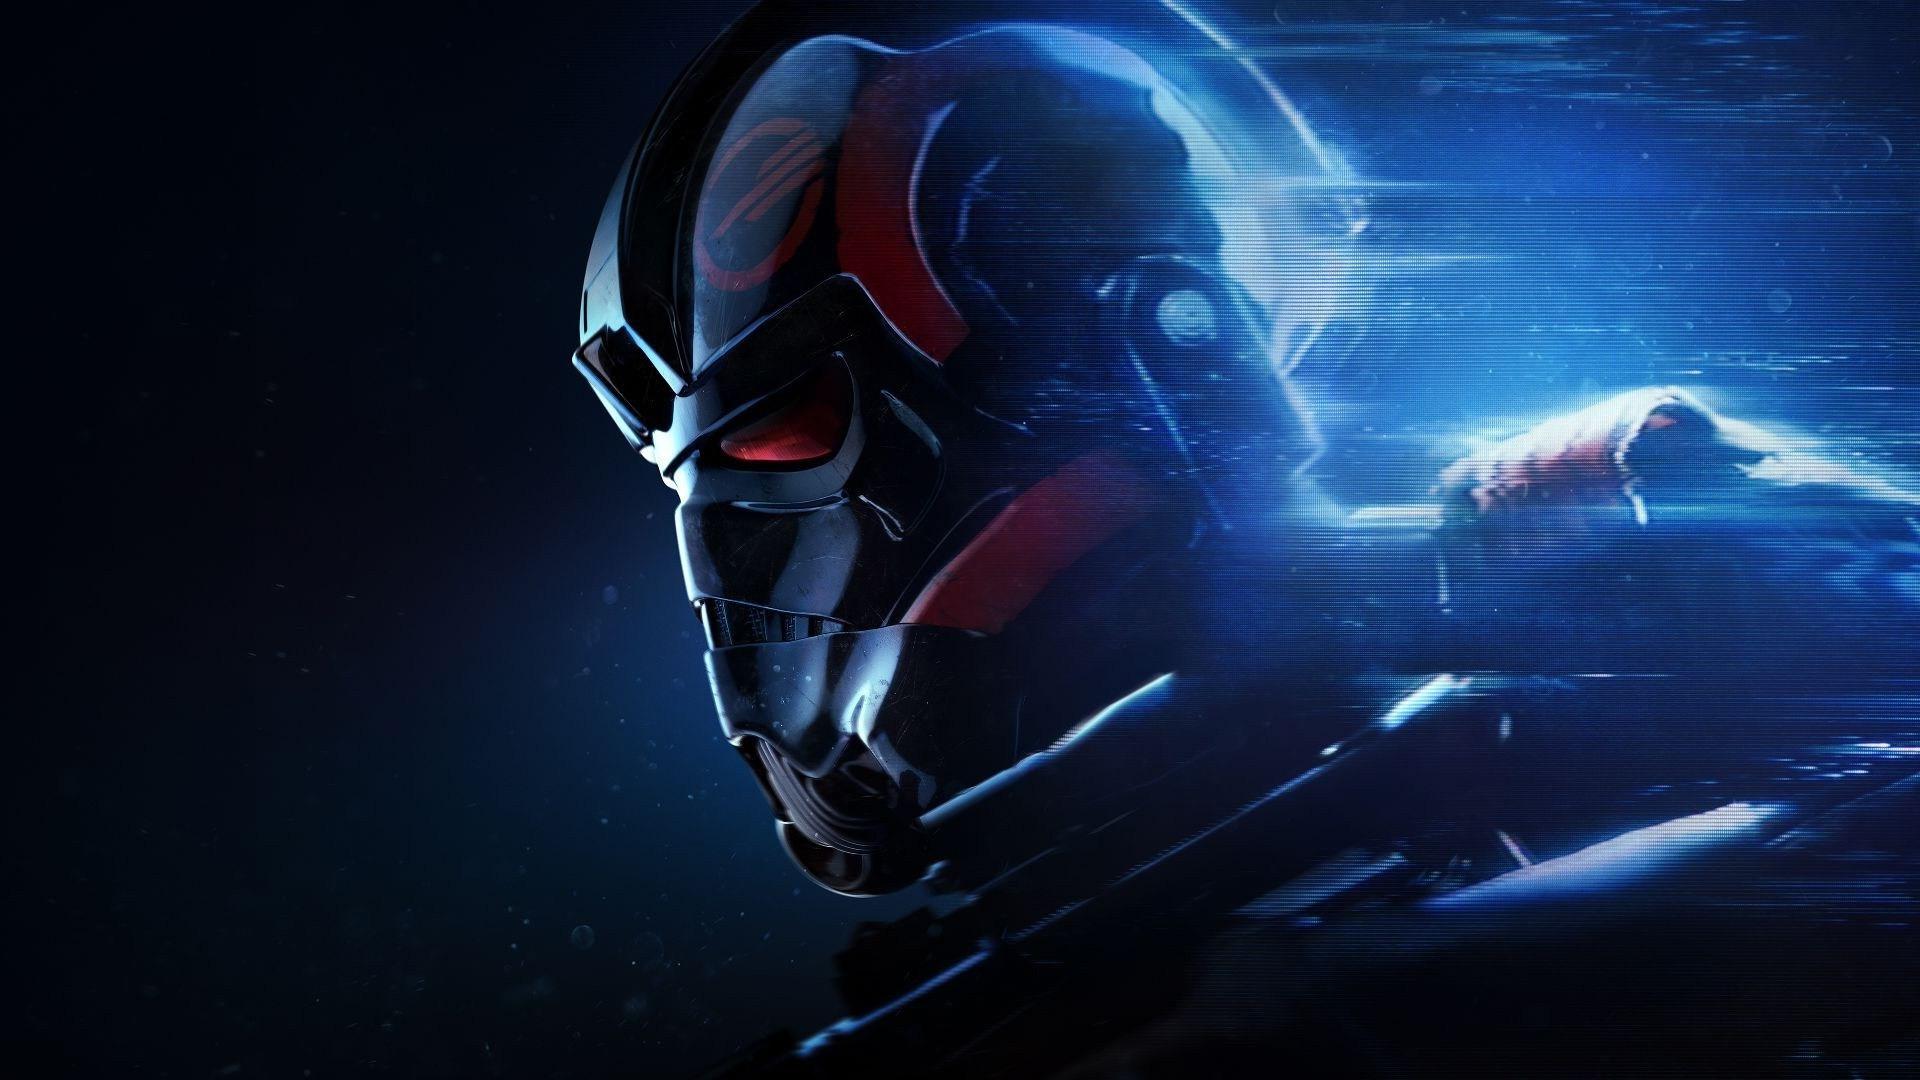 Star Wars Battlefront Wallpapers 1080p (82+ Images